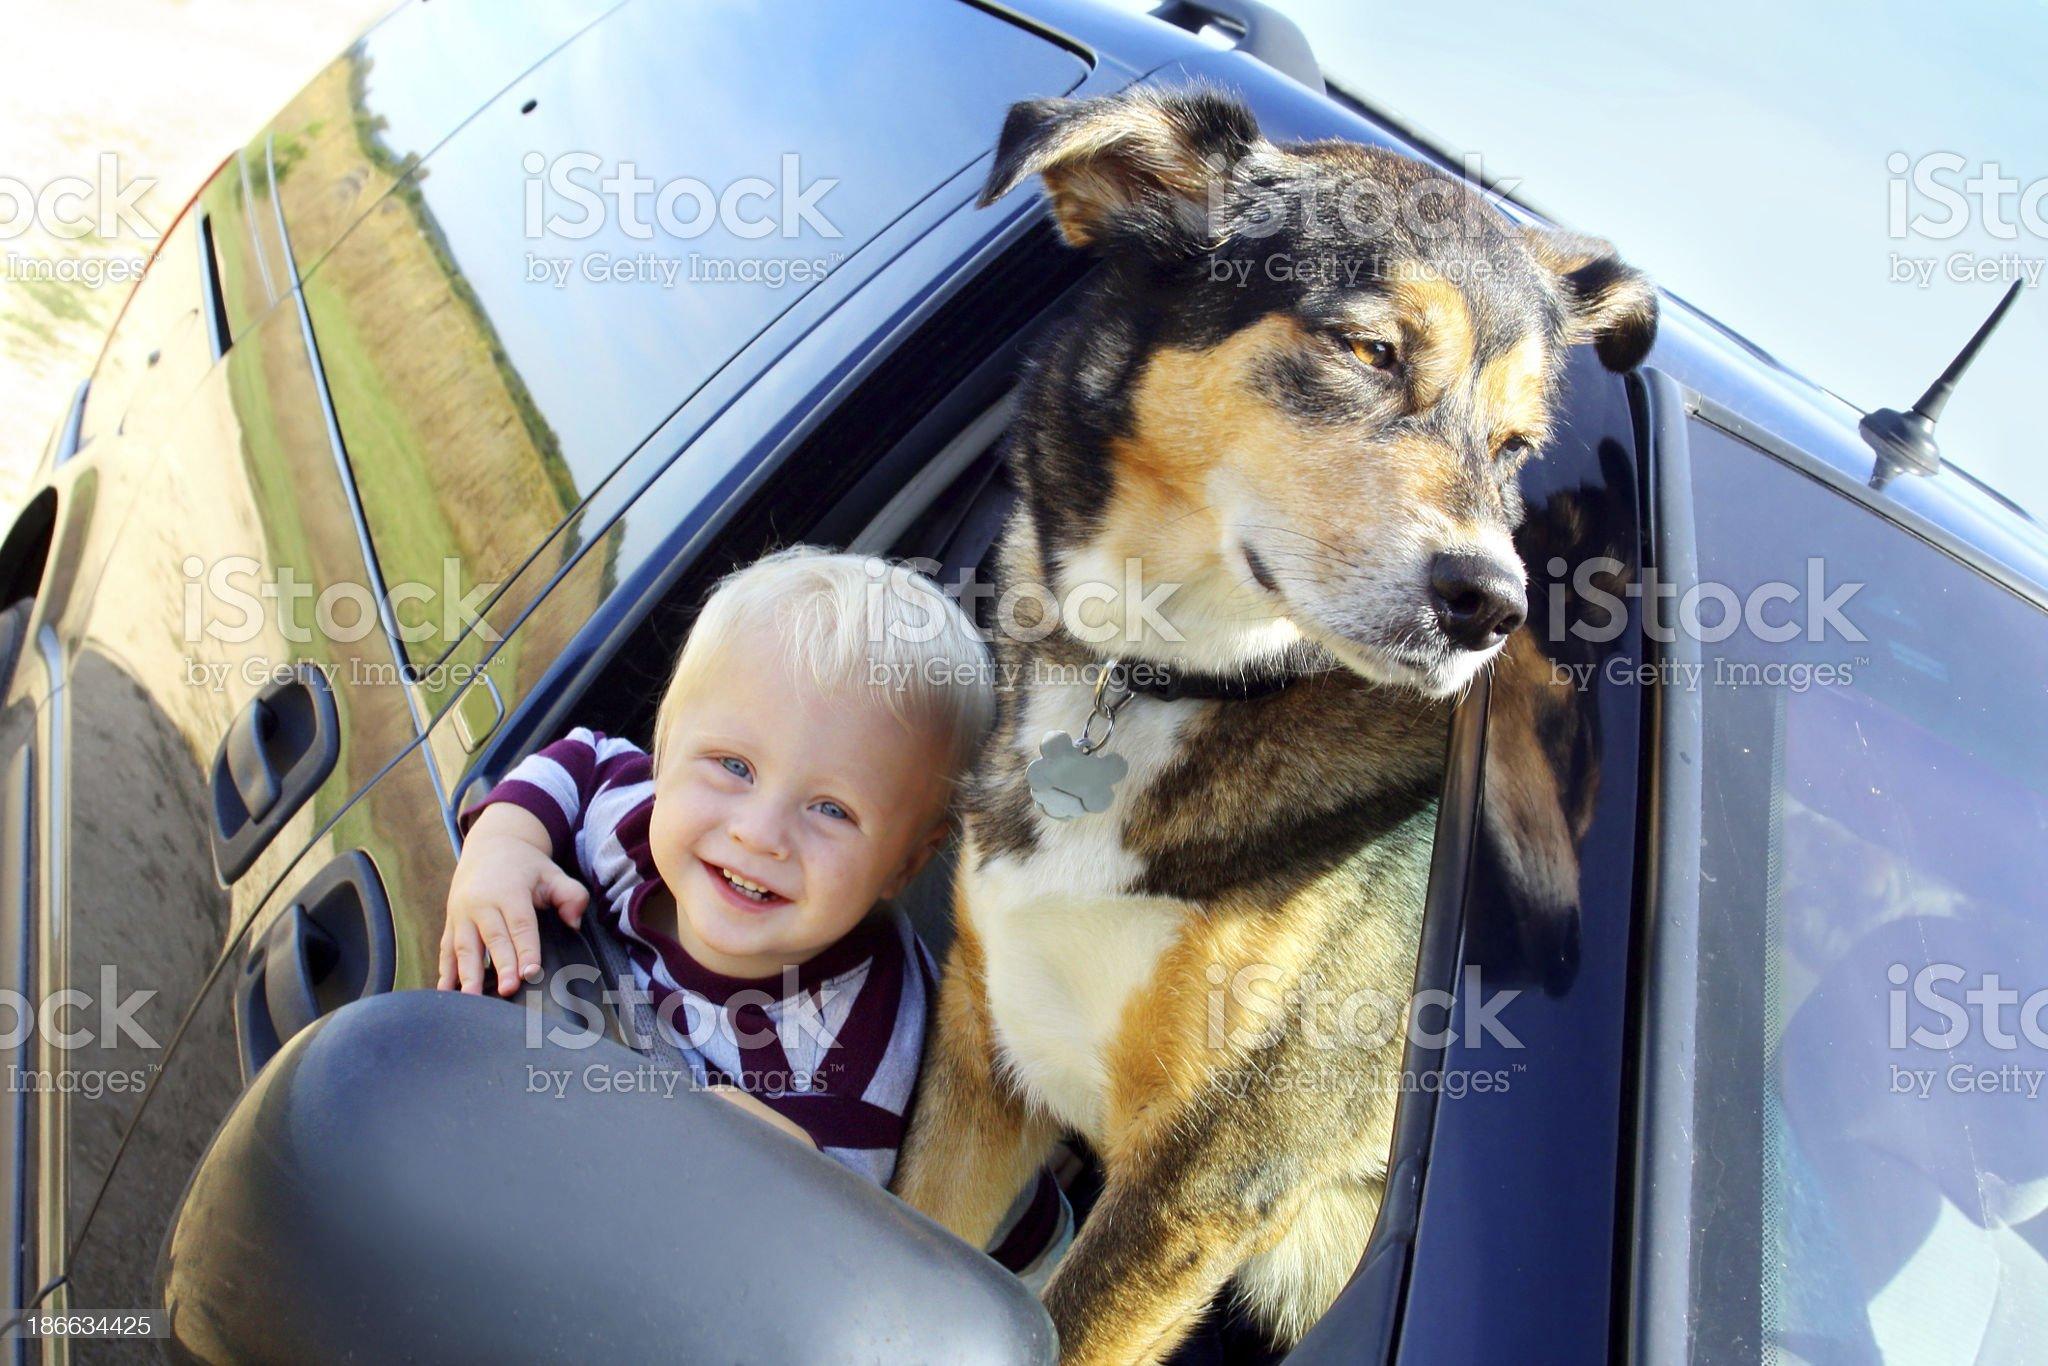 Happy Baby and Dog in Minivan Window royalty-free stock photo